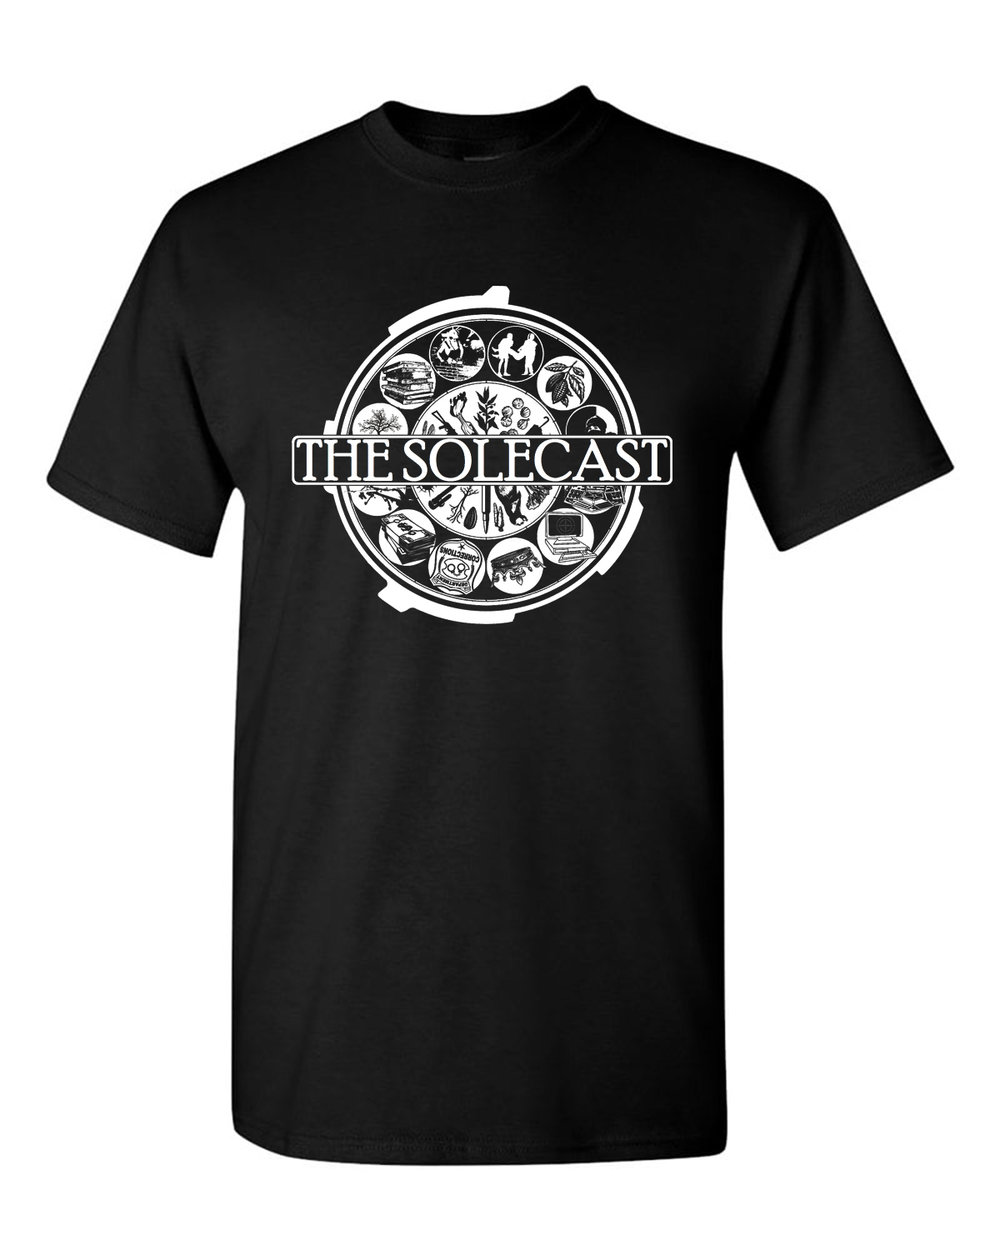 Solecast T-shirt